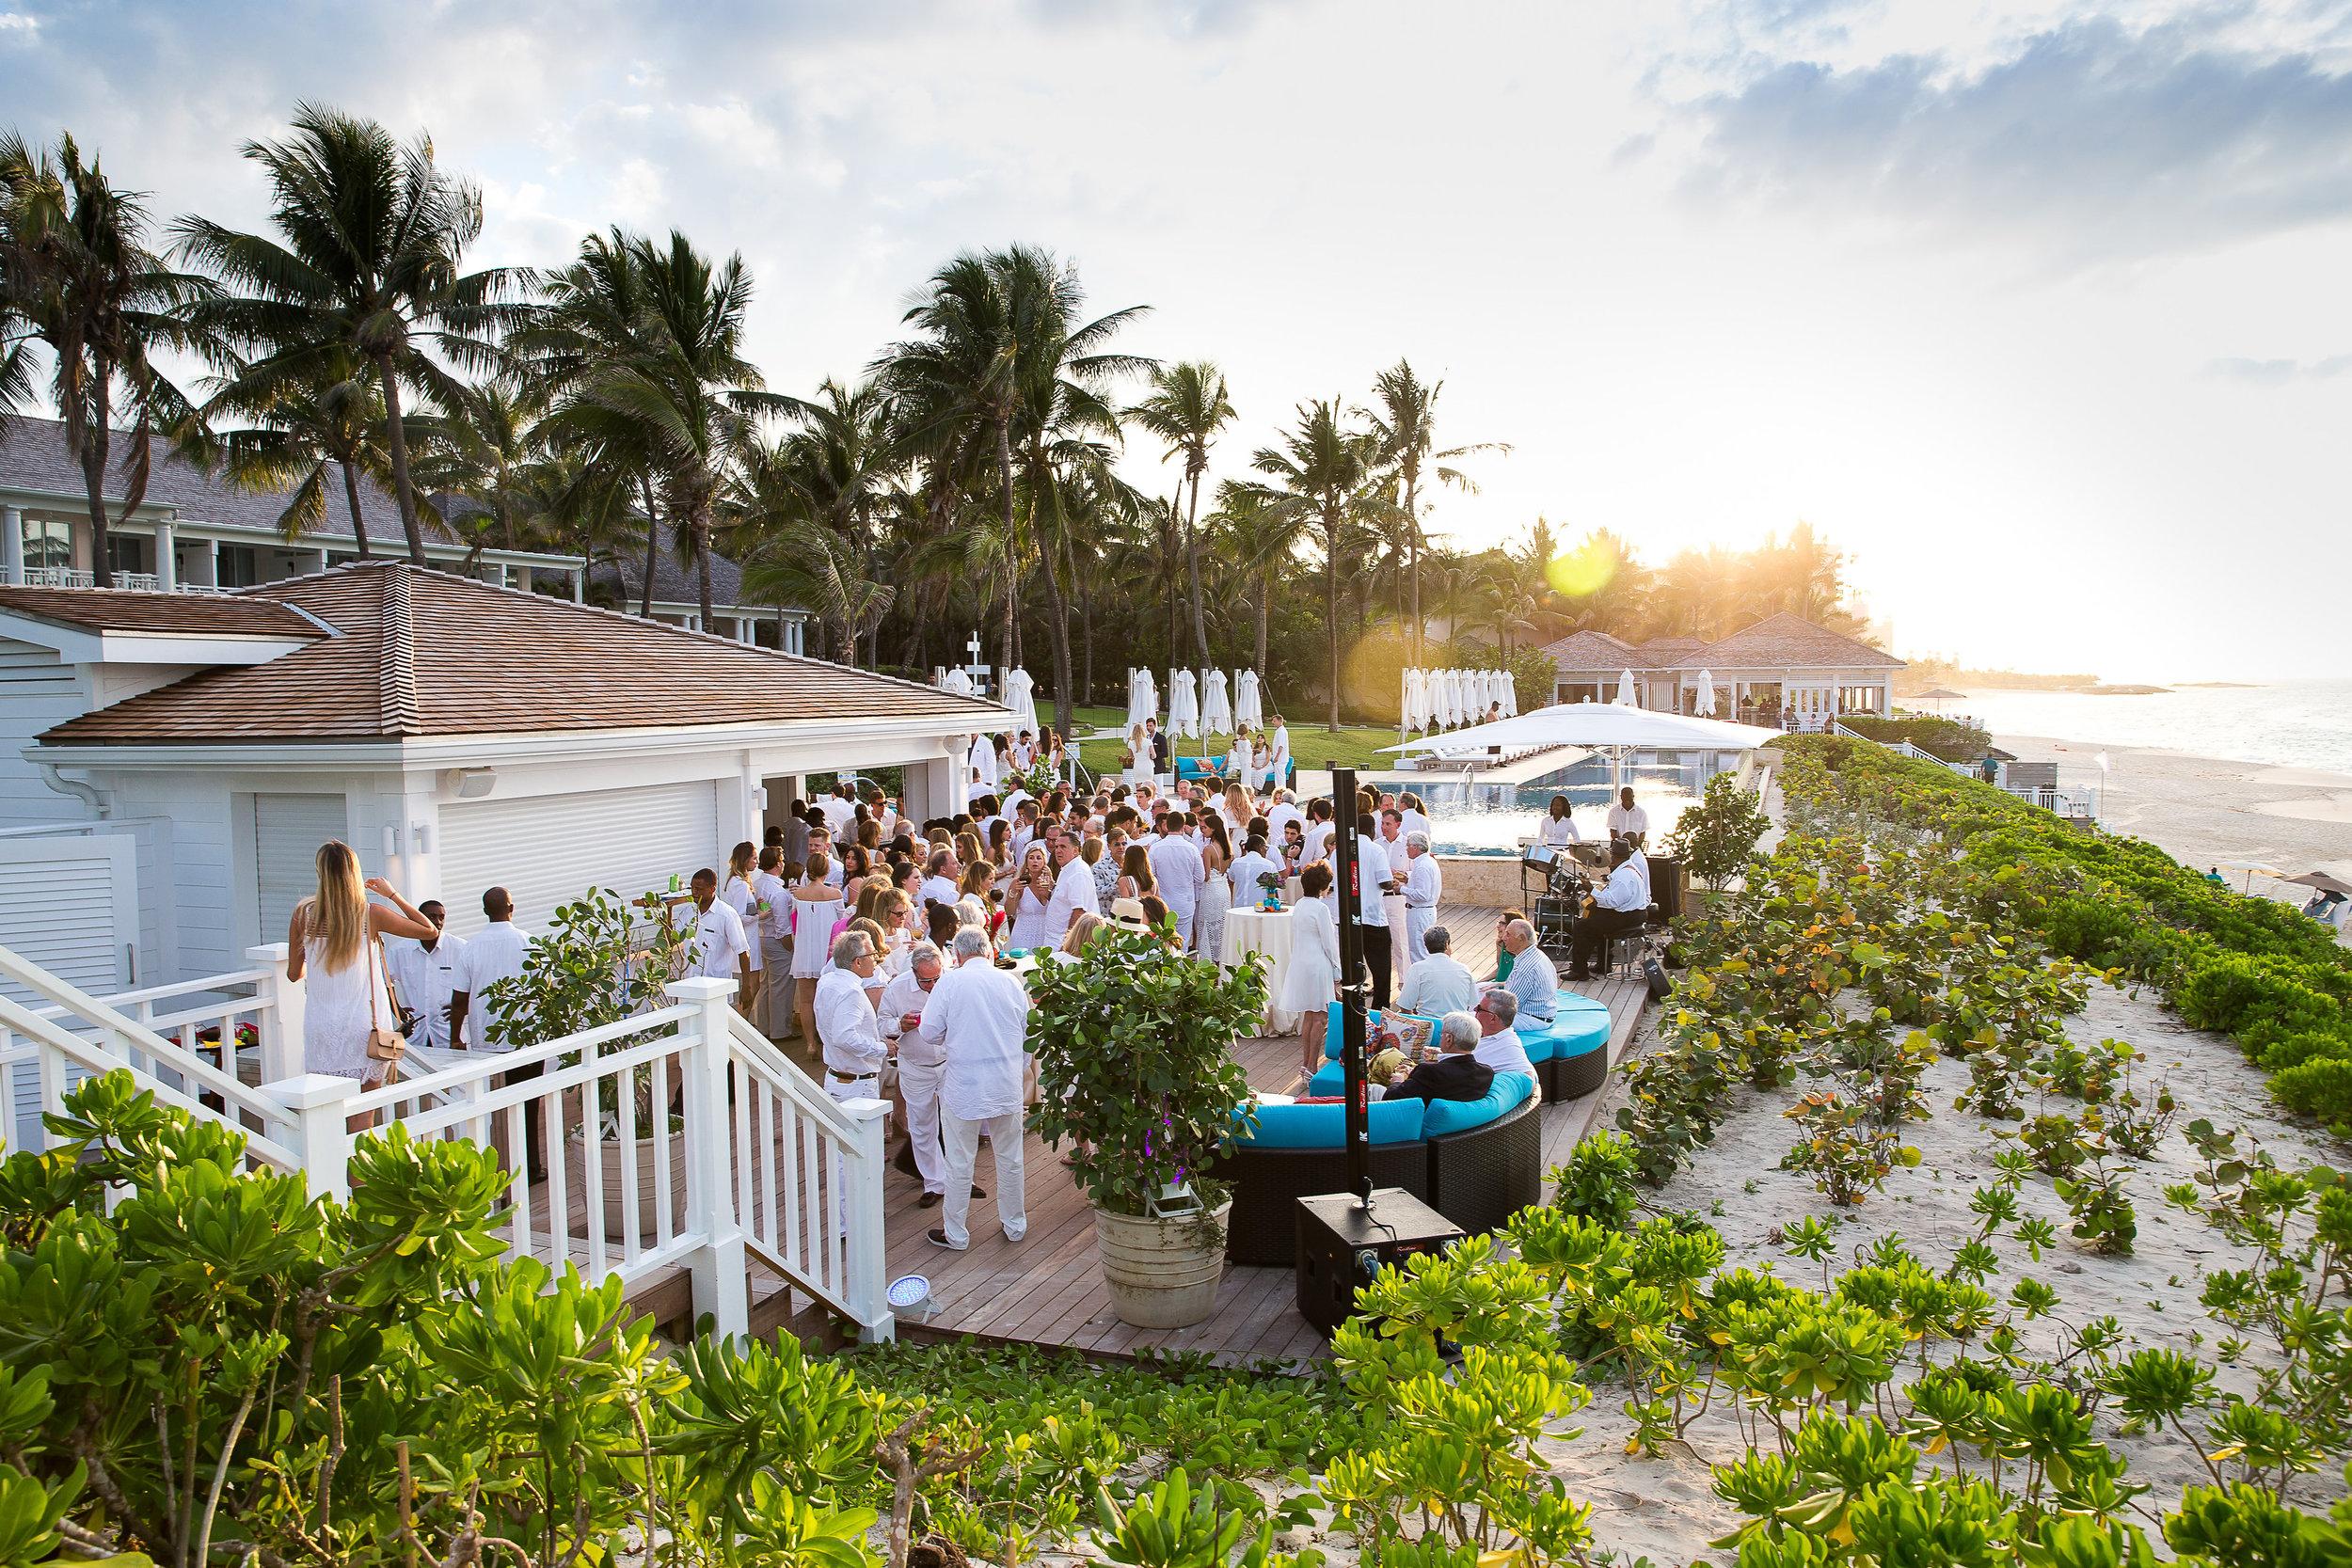 Ceci_New_York_Ceci_Style_Ceci_Johnson_Luxury_Lifestyle_Destination_Bahamas_Wedding_Letterpress_Inspiration_Design_Custom_Couture_Personalized_Invitations_33.jpg